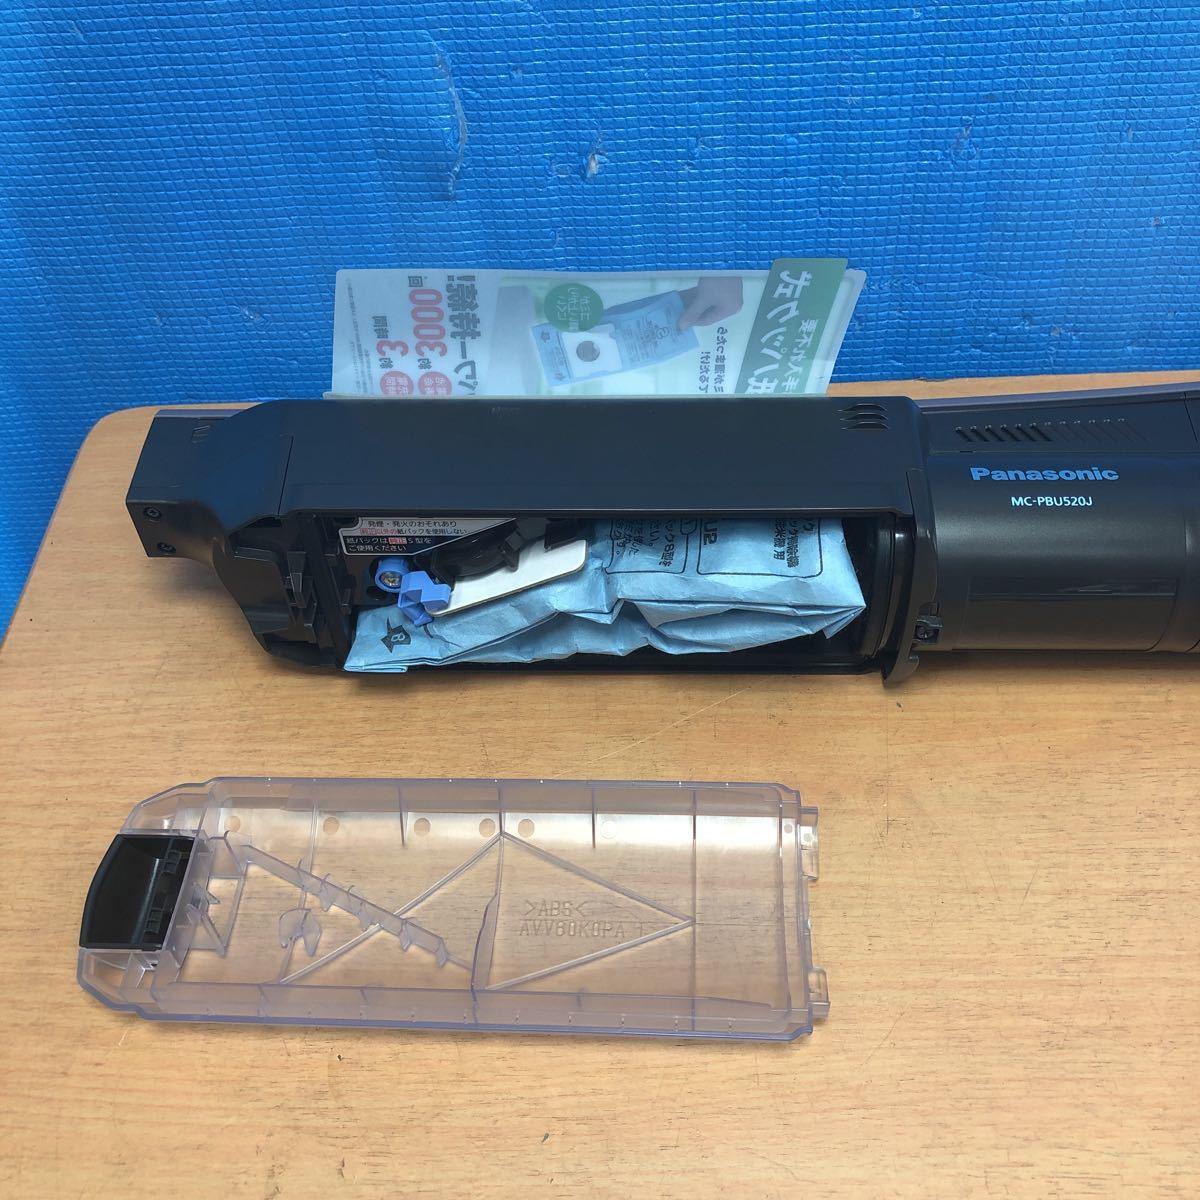 Panasonic ハウスダスト発見センサー付き 紙パック式コードレスクリーナー MC-PBU520J 店舗展示サンプル用実演機 (25)_画像3